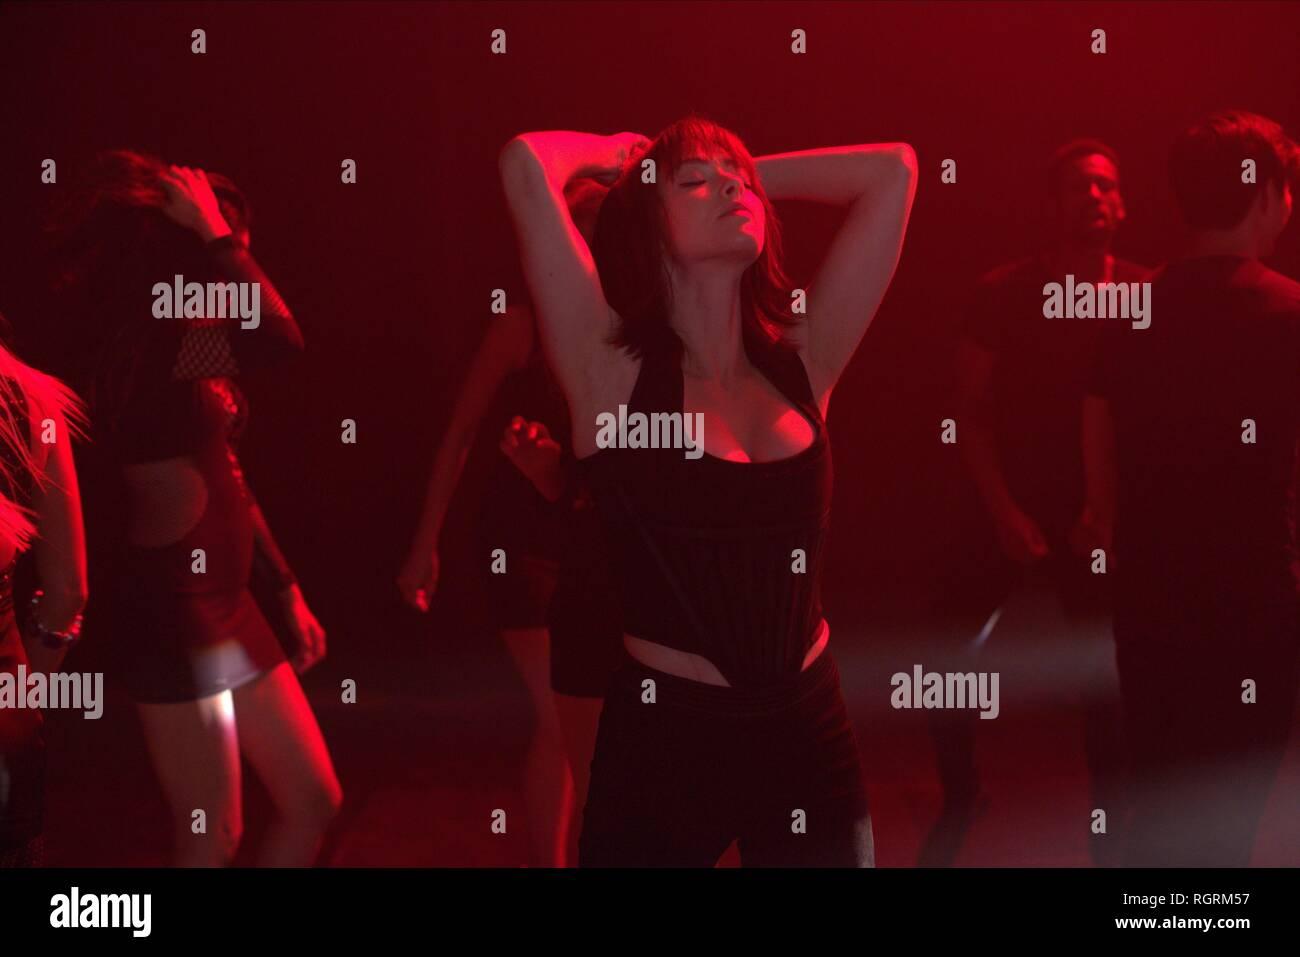 AMANDA SEYFRIED ANON (2018) - Stock Image